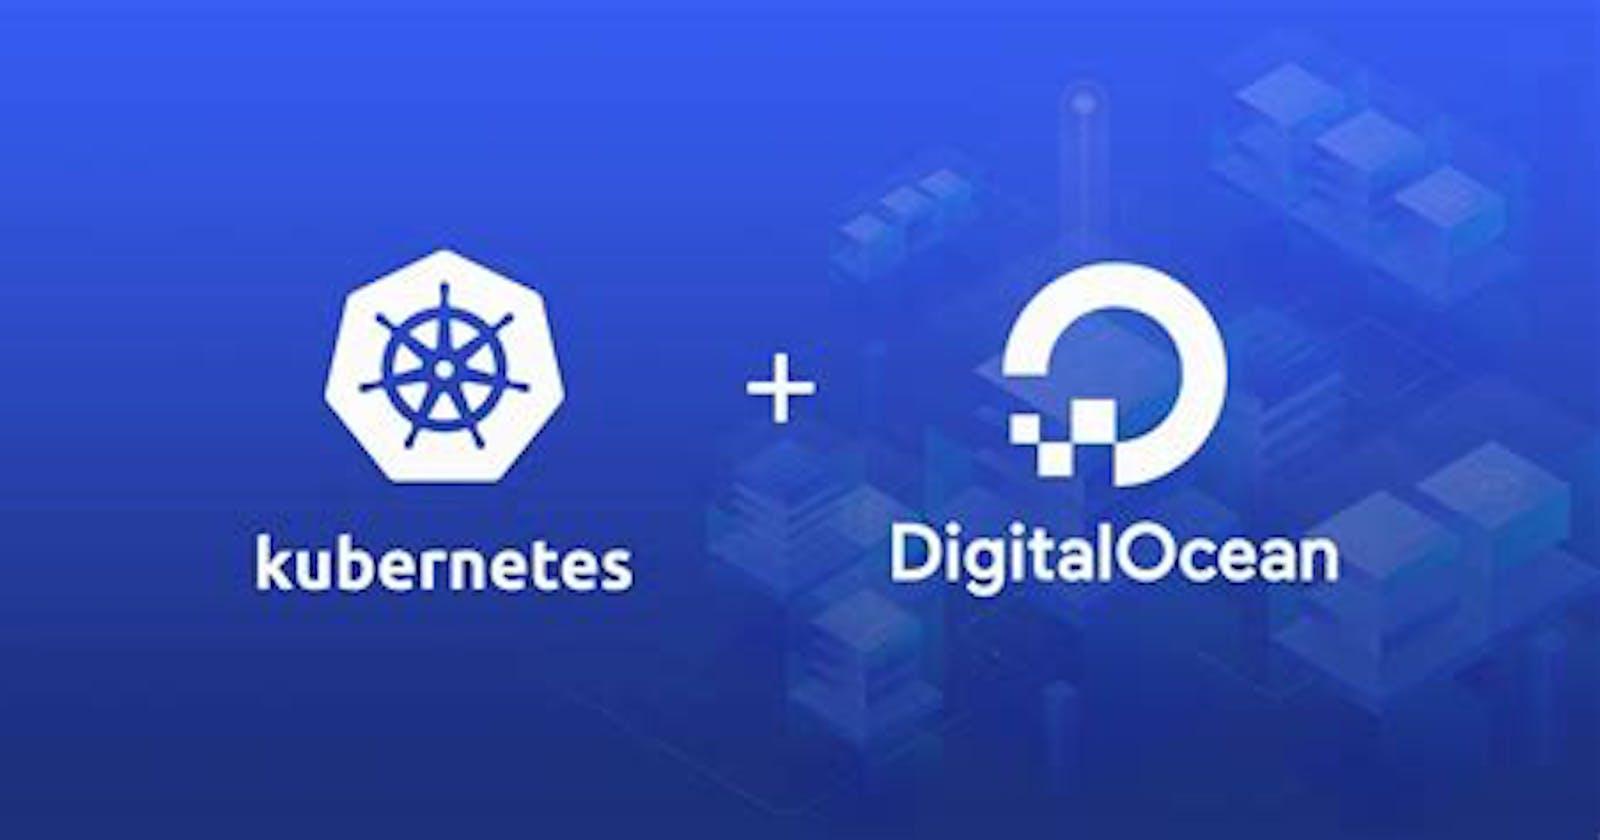 How to Configure DigitalOcean Kubernetes Infrastructure